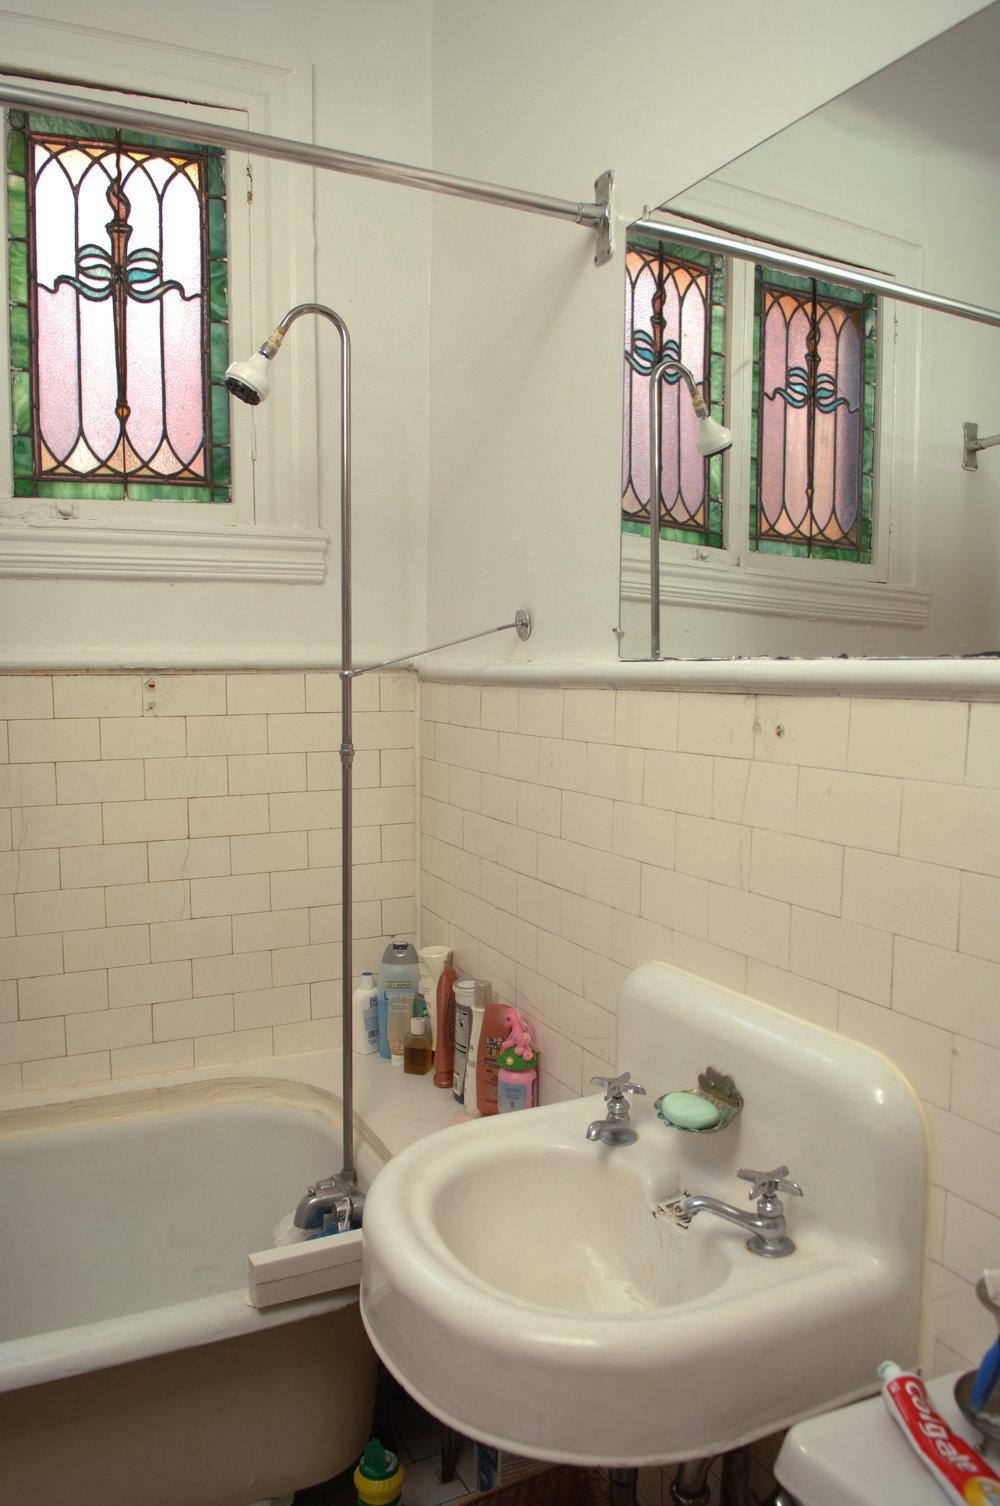 222 full bath 2.jpg